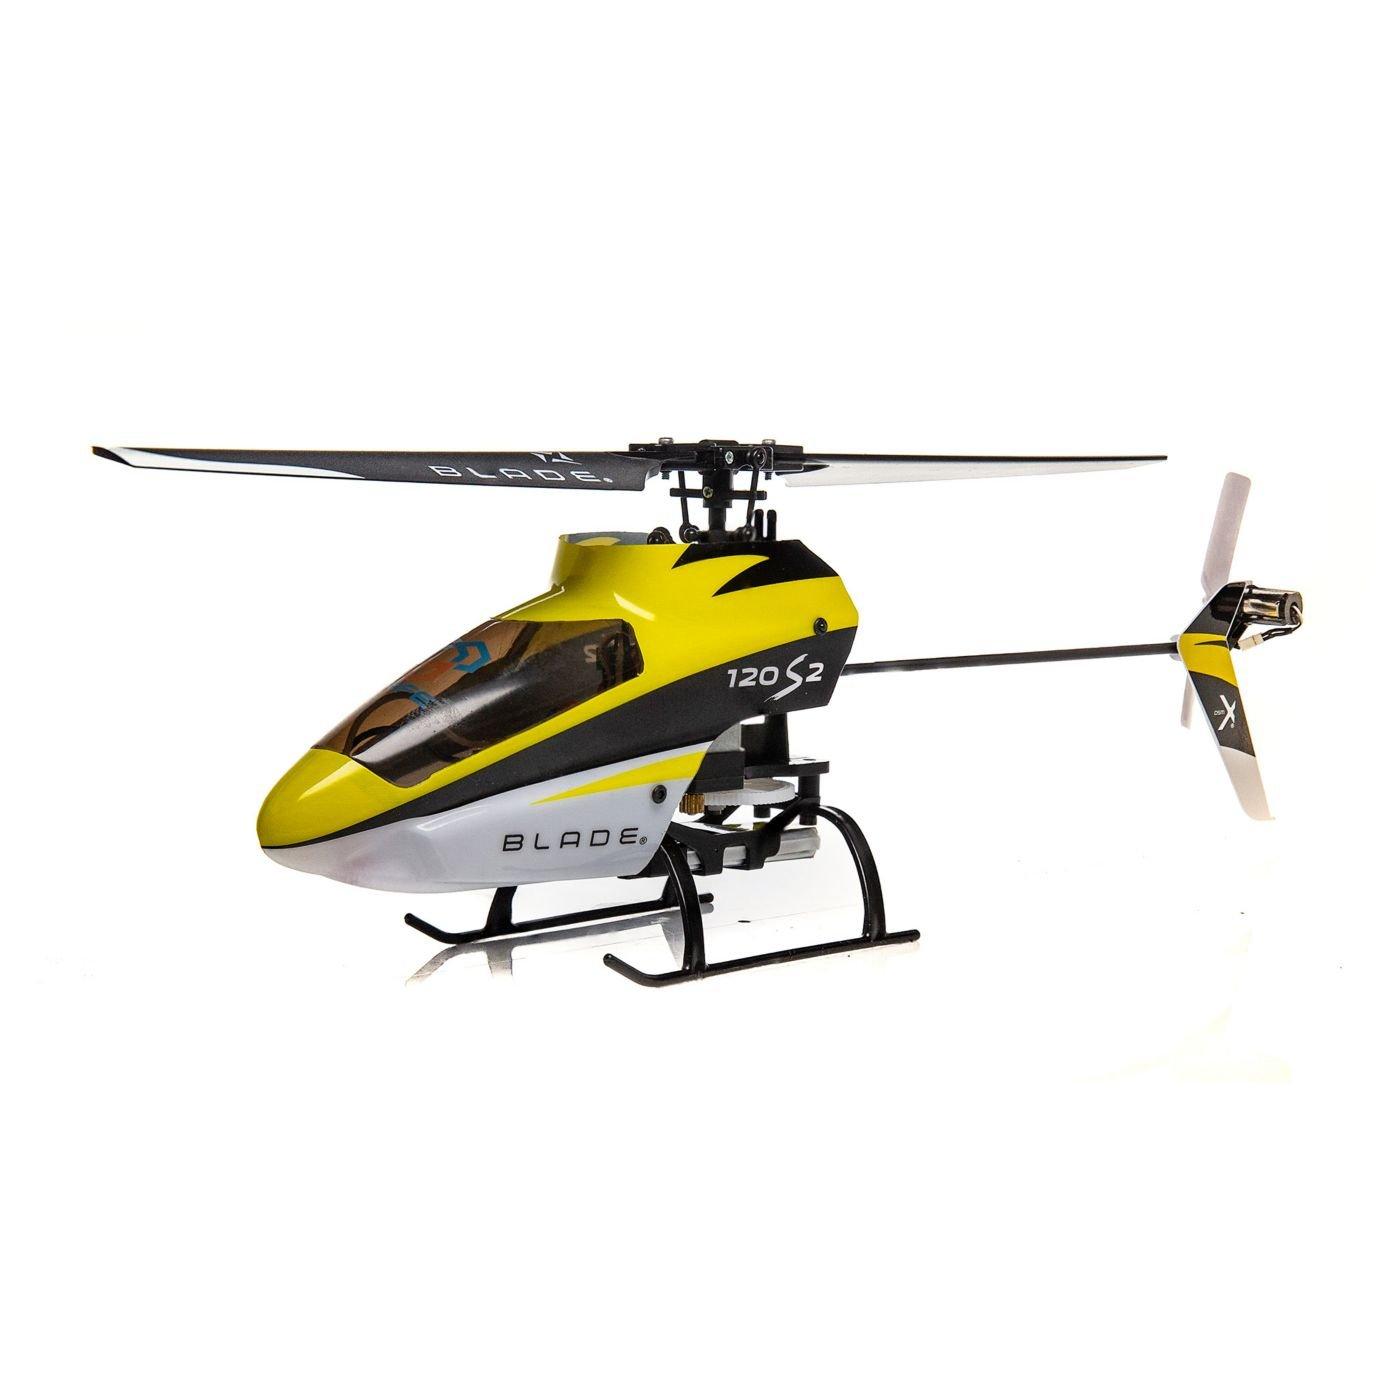 Blade 120 S2 RTF w/SAFE